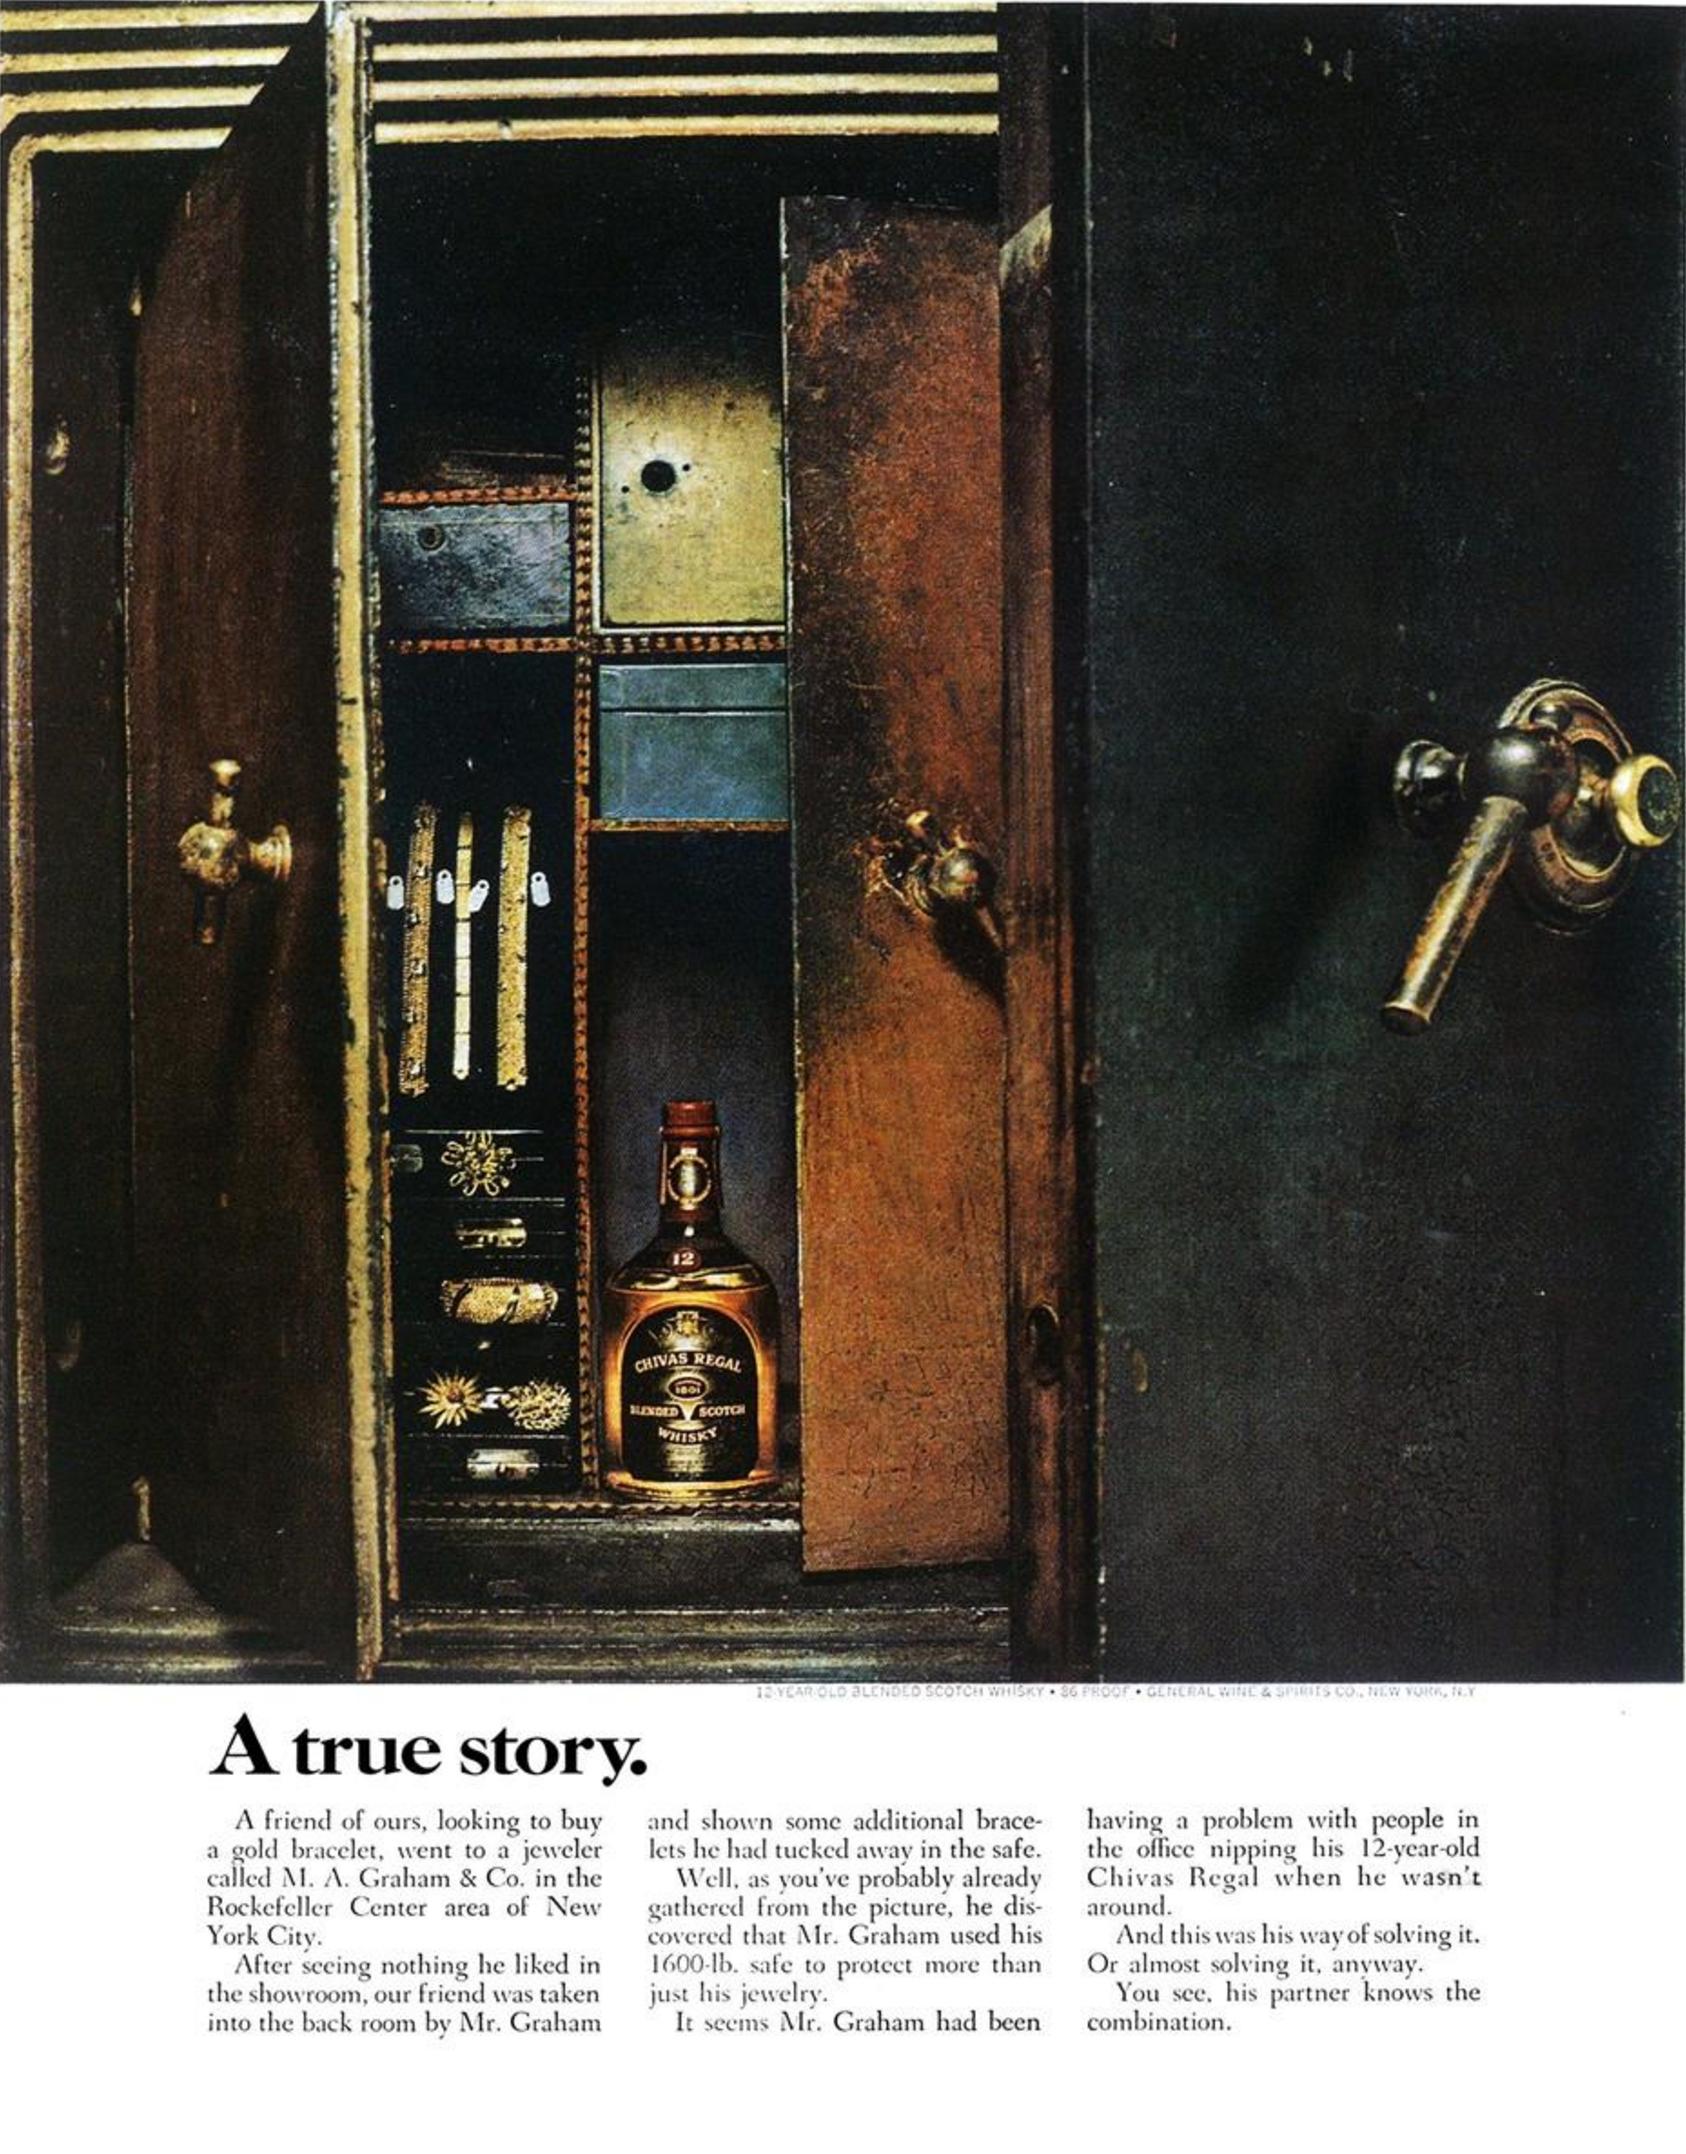 4. 'A True Story*' Chivas Regal, DDB NY (Esquire)